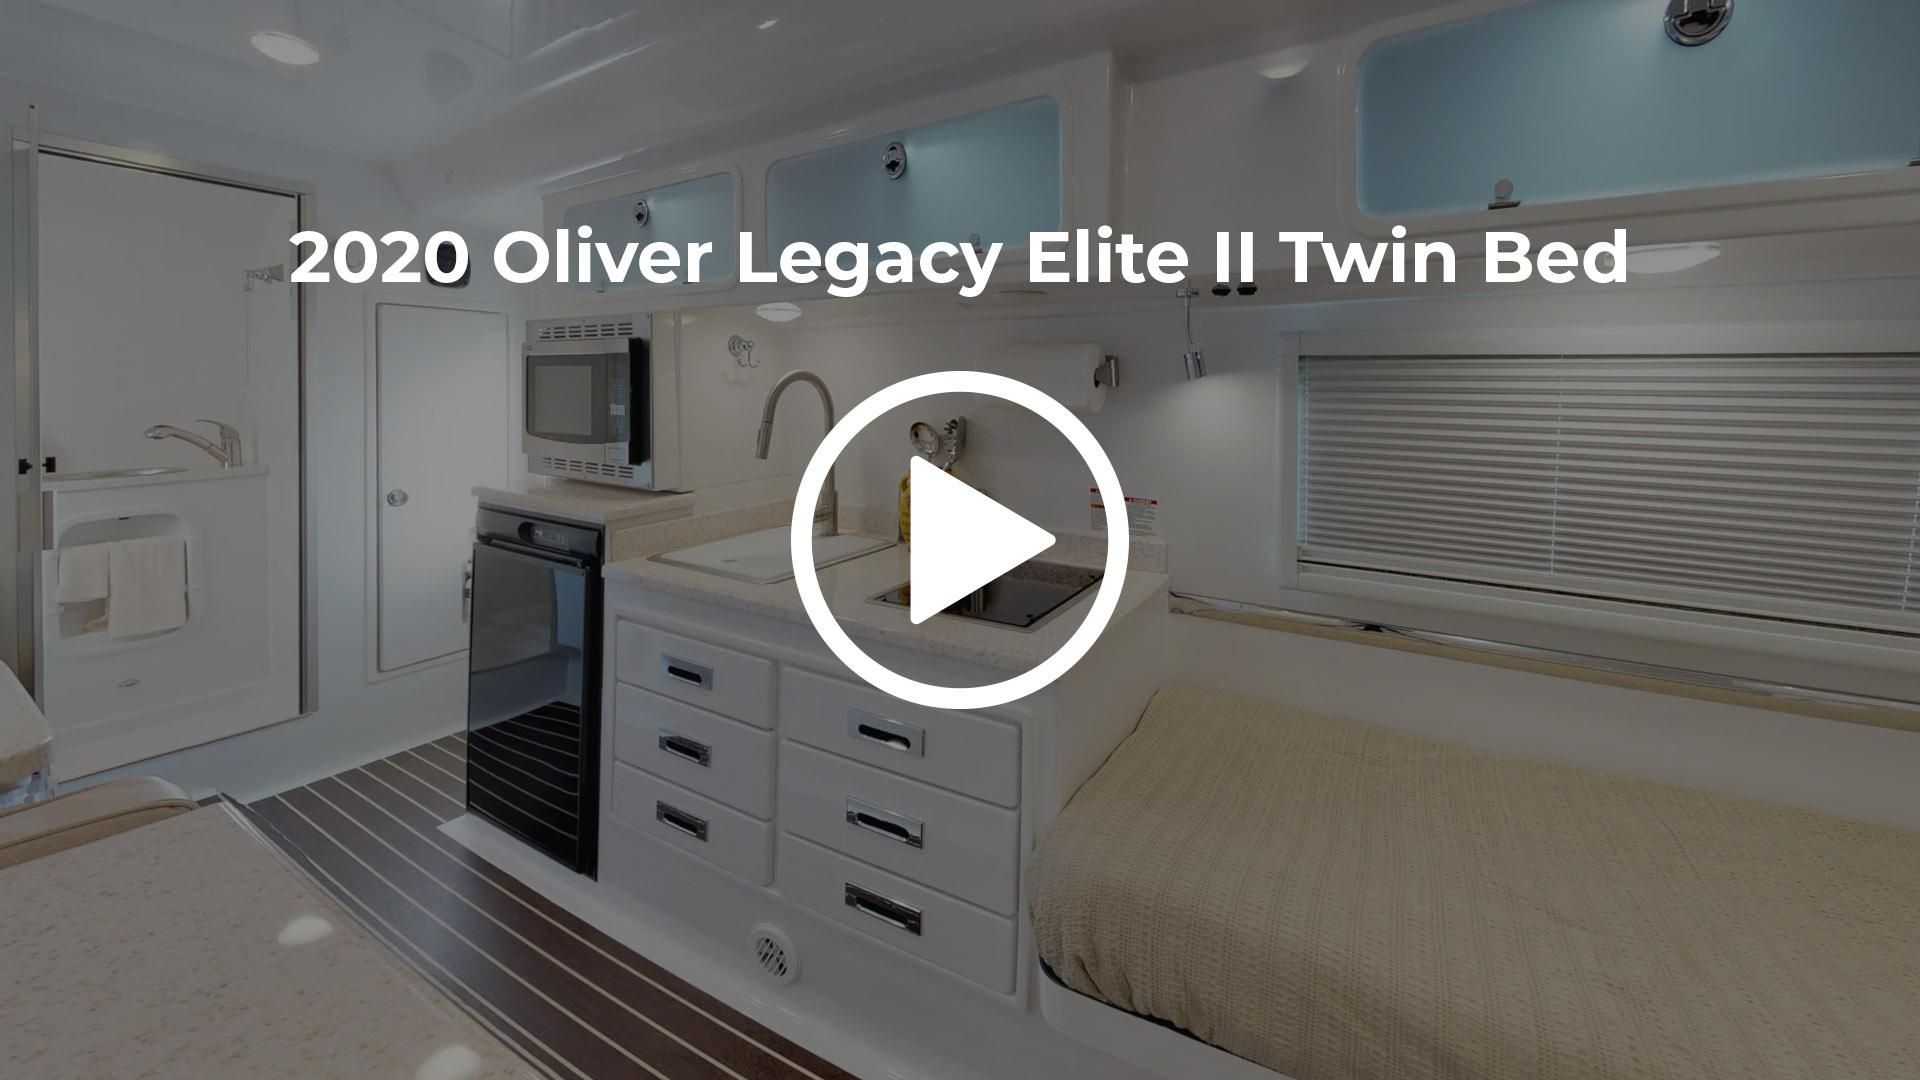 rv legacy elite II virtual tour twin bed floor plan